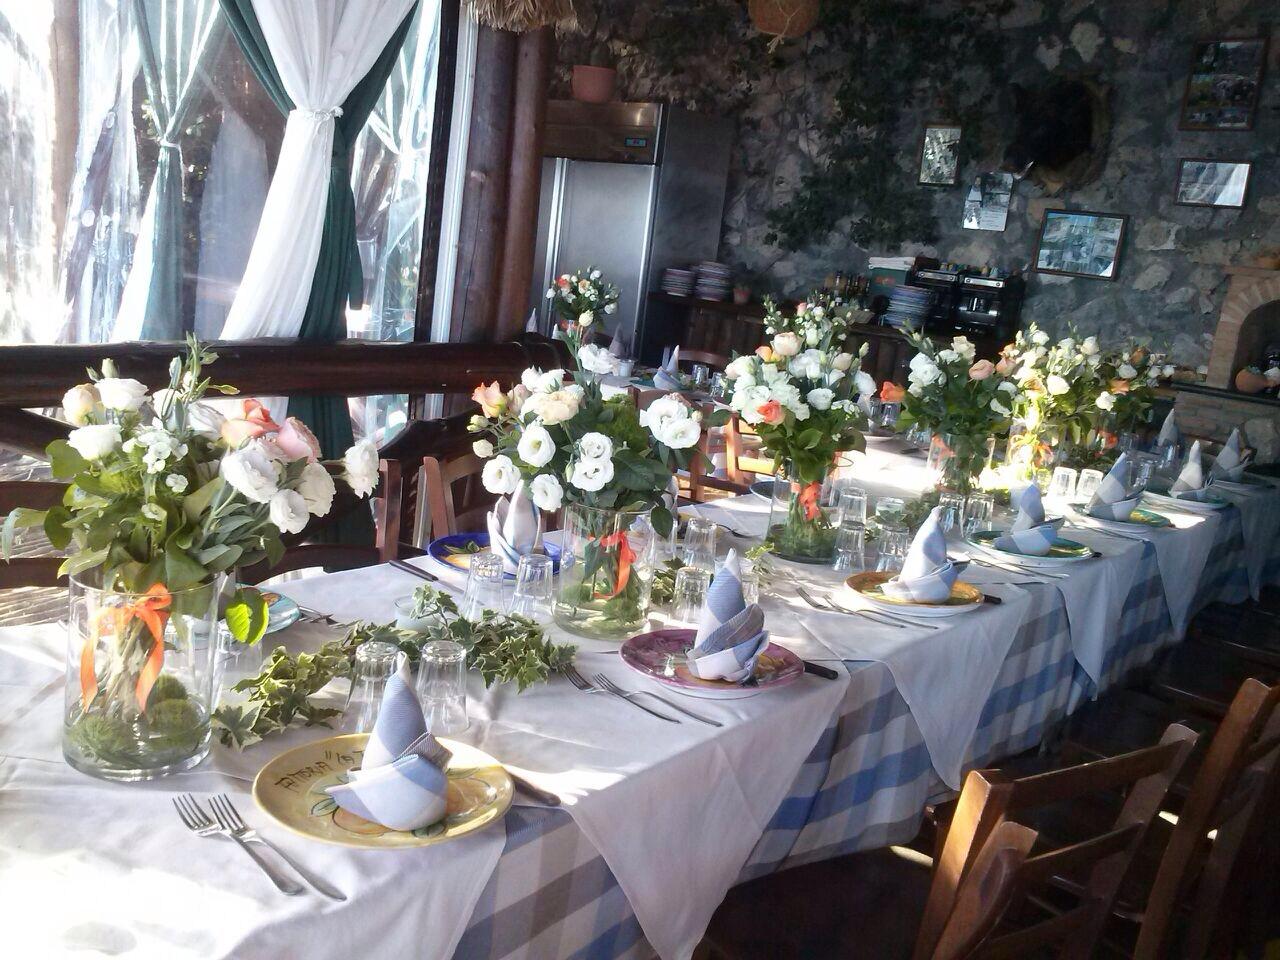 https://www.weddingamalfi.com/wp-content/uploads/Laura-and-Jarrod-guest-wedding-table-decoration.jpg